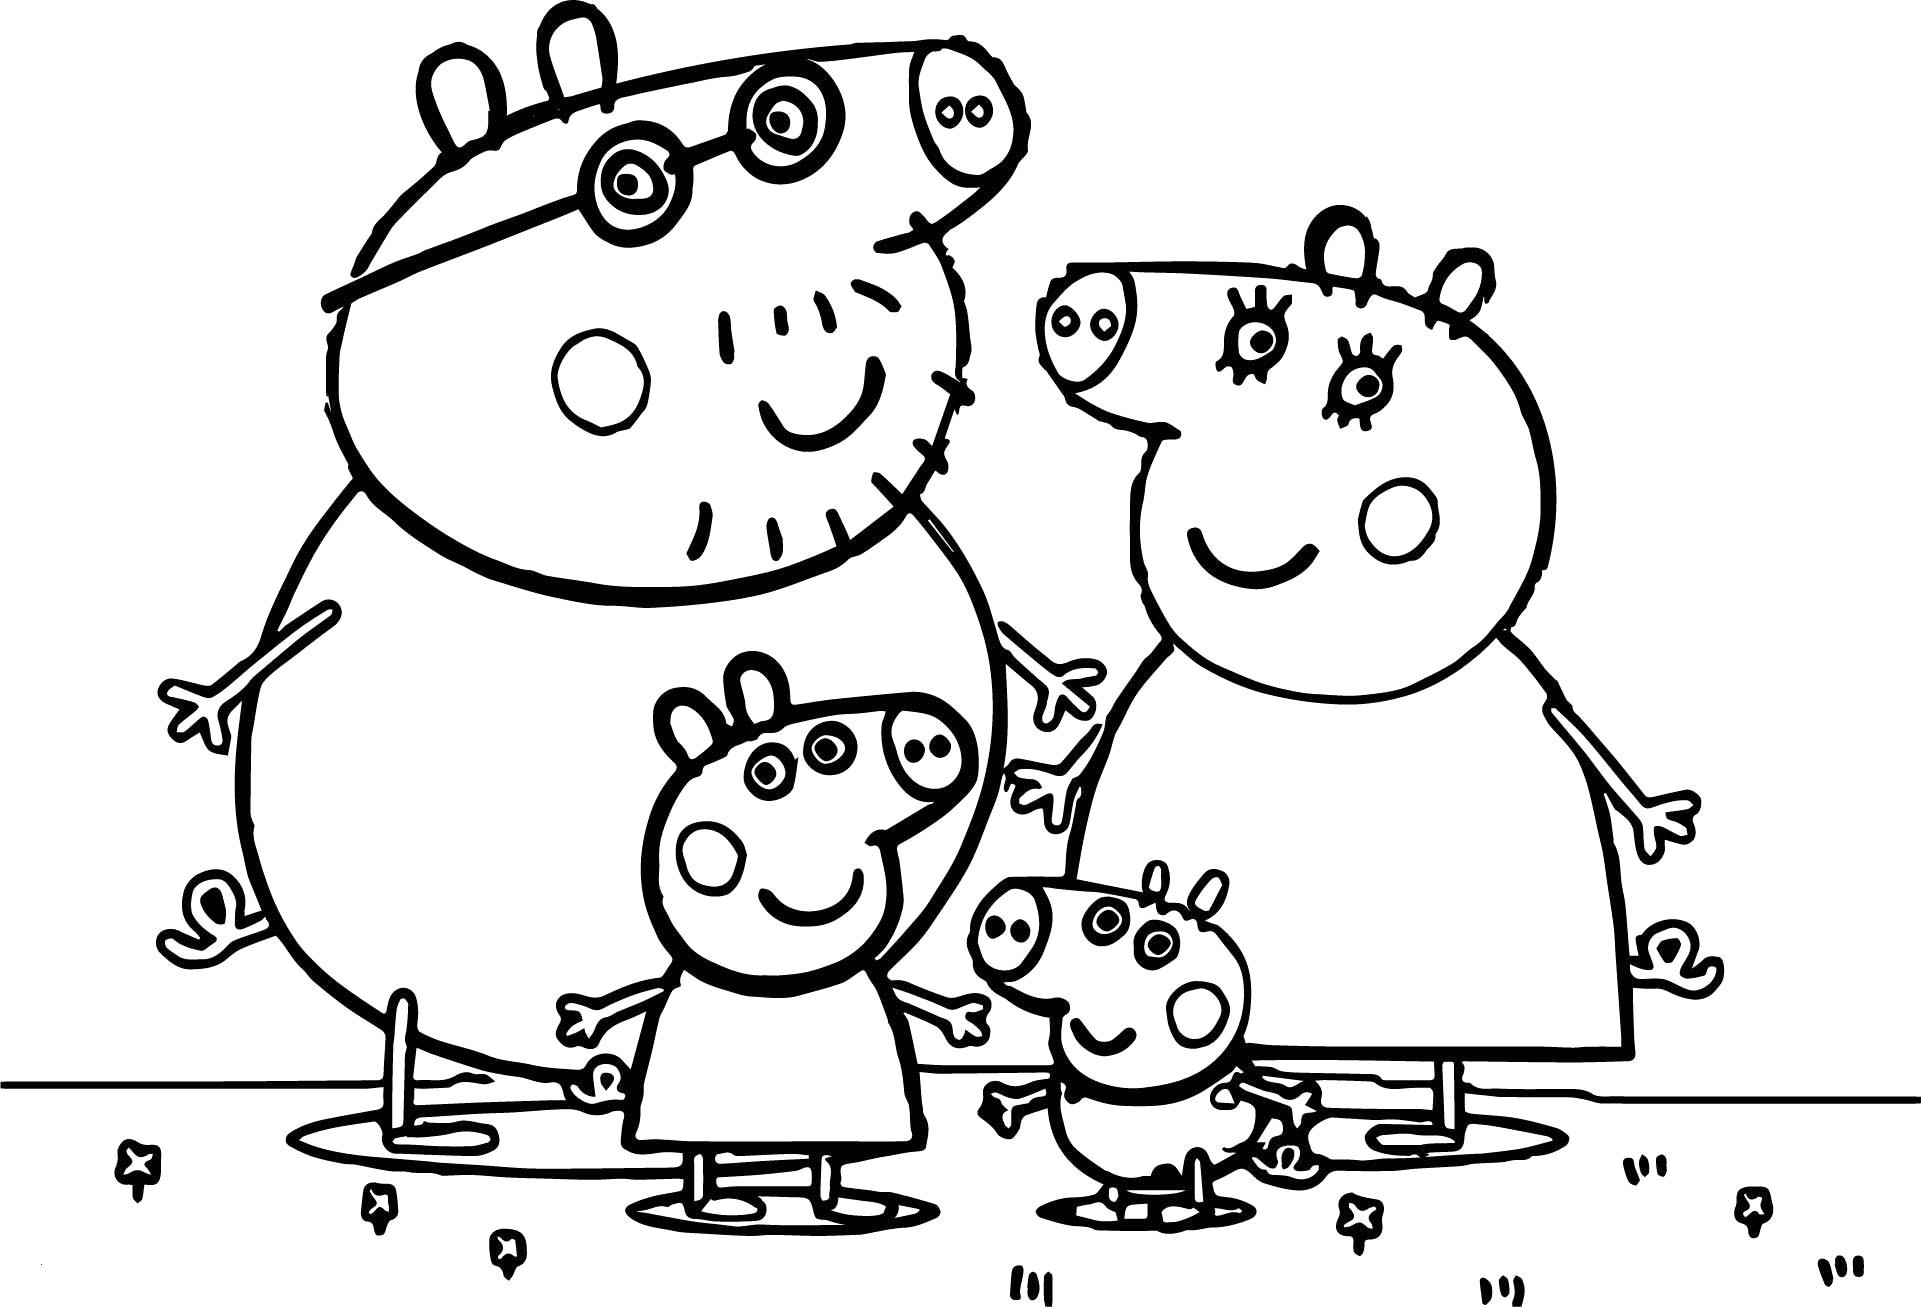 Dibujos De Peppa Para Colorear E Imprimir: Peppa Pig Para Colorir [Imprimir]